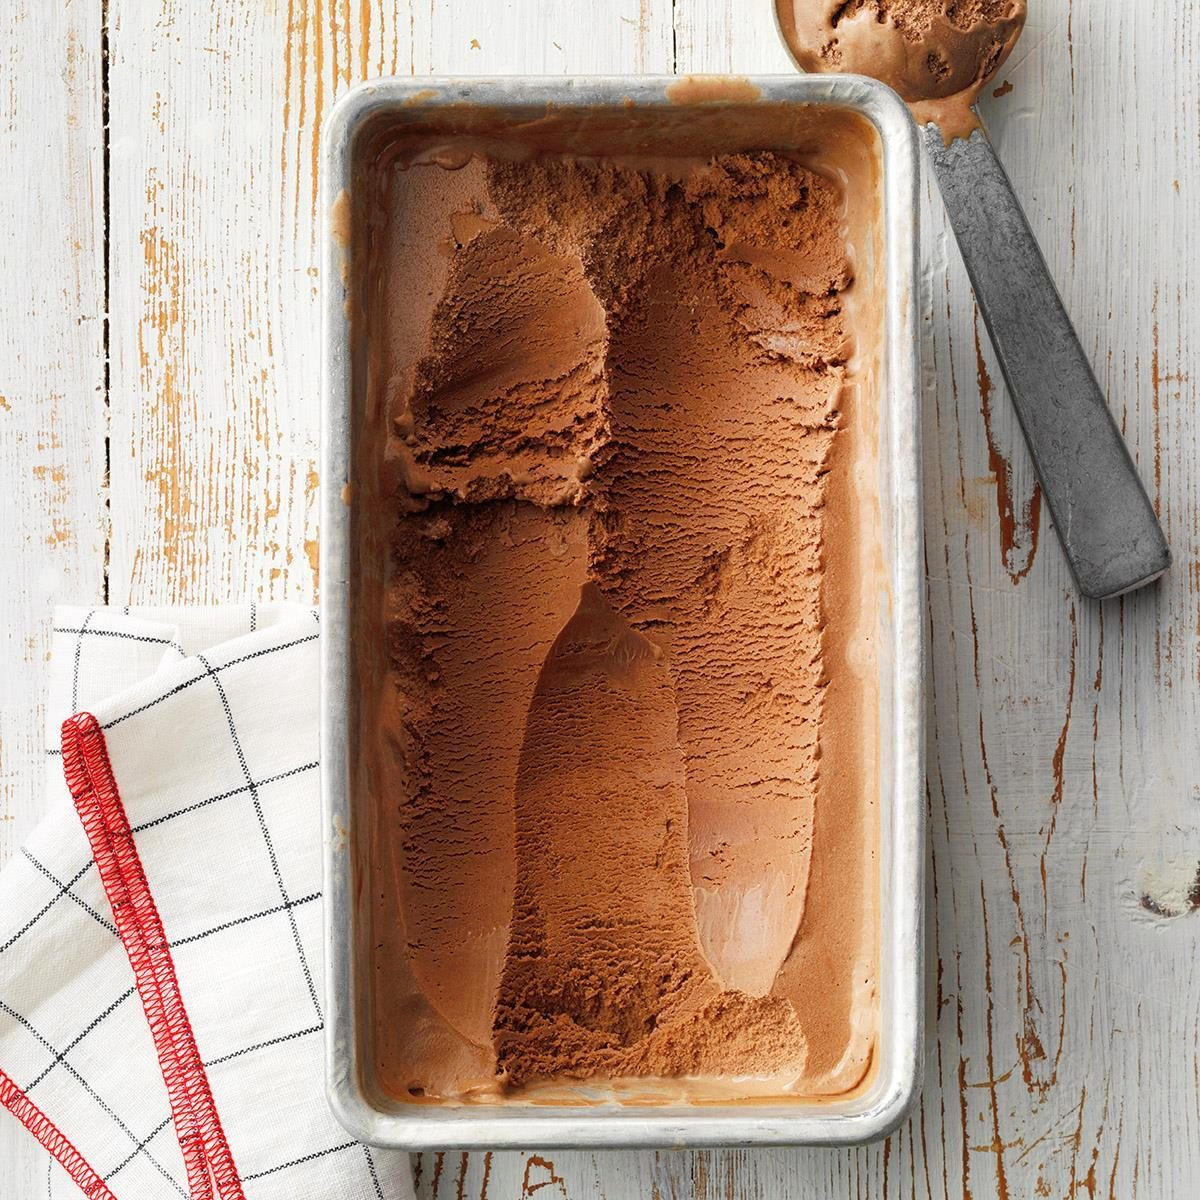 Dark chocolate ice cream with paprika